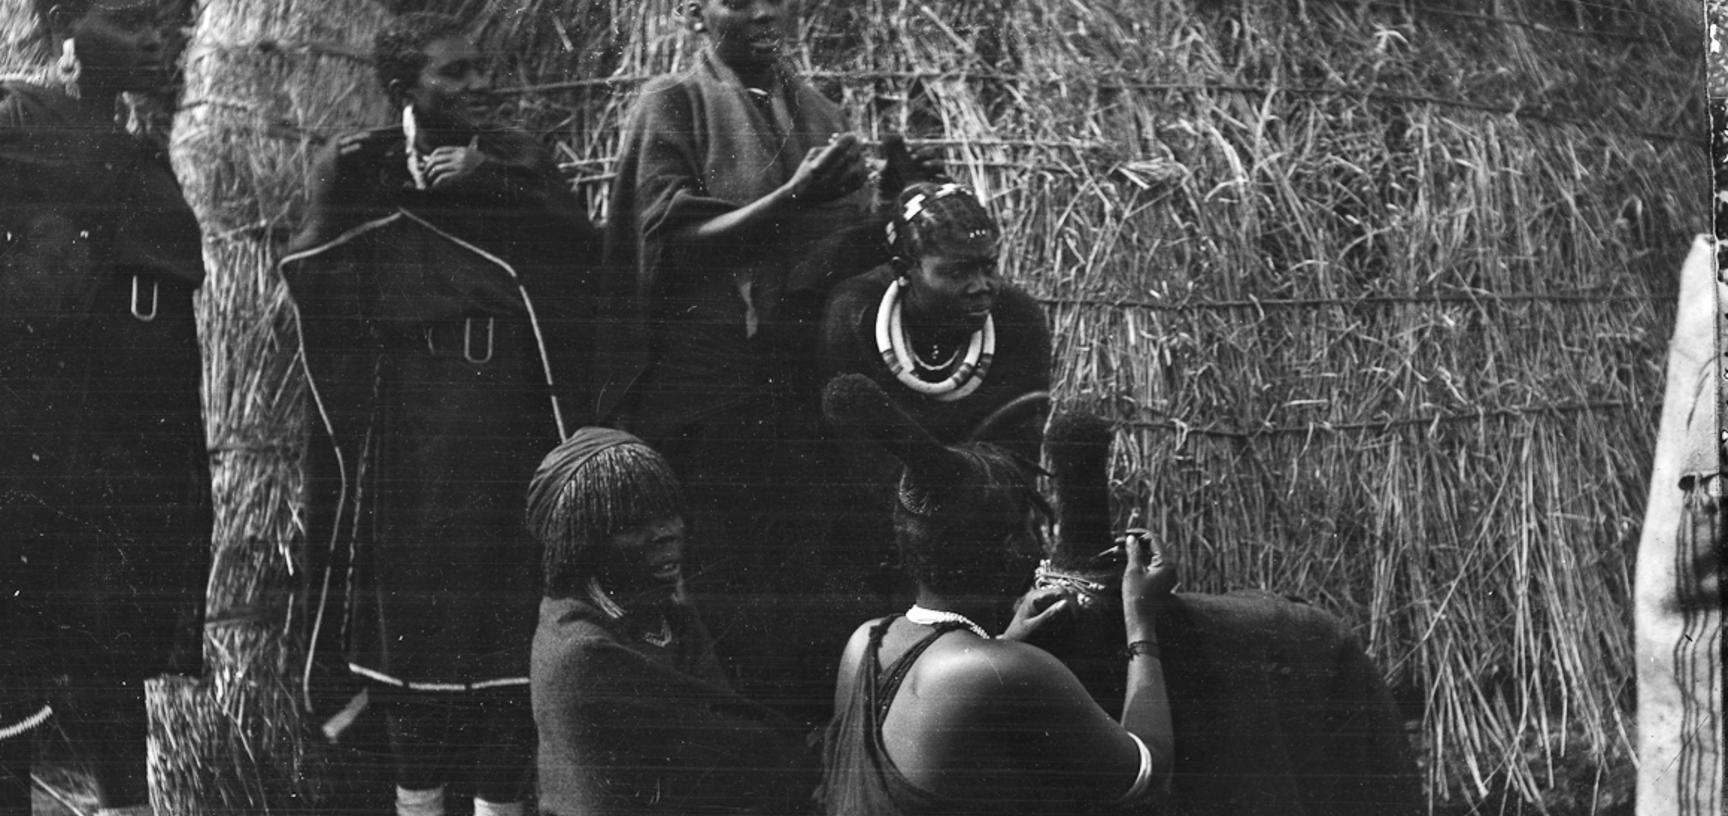 Group of Zulu women dressing each other's hair. Photo taken by Henry Balfour near Pietermaritzburg, South Africa, 1905 [1999.11.27].